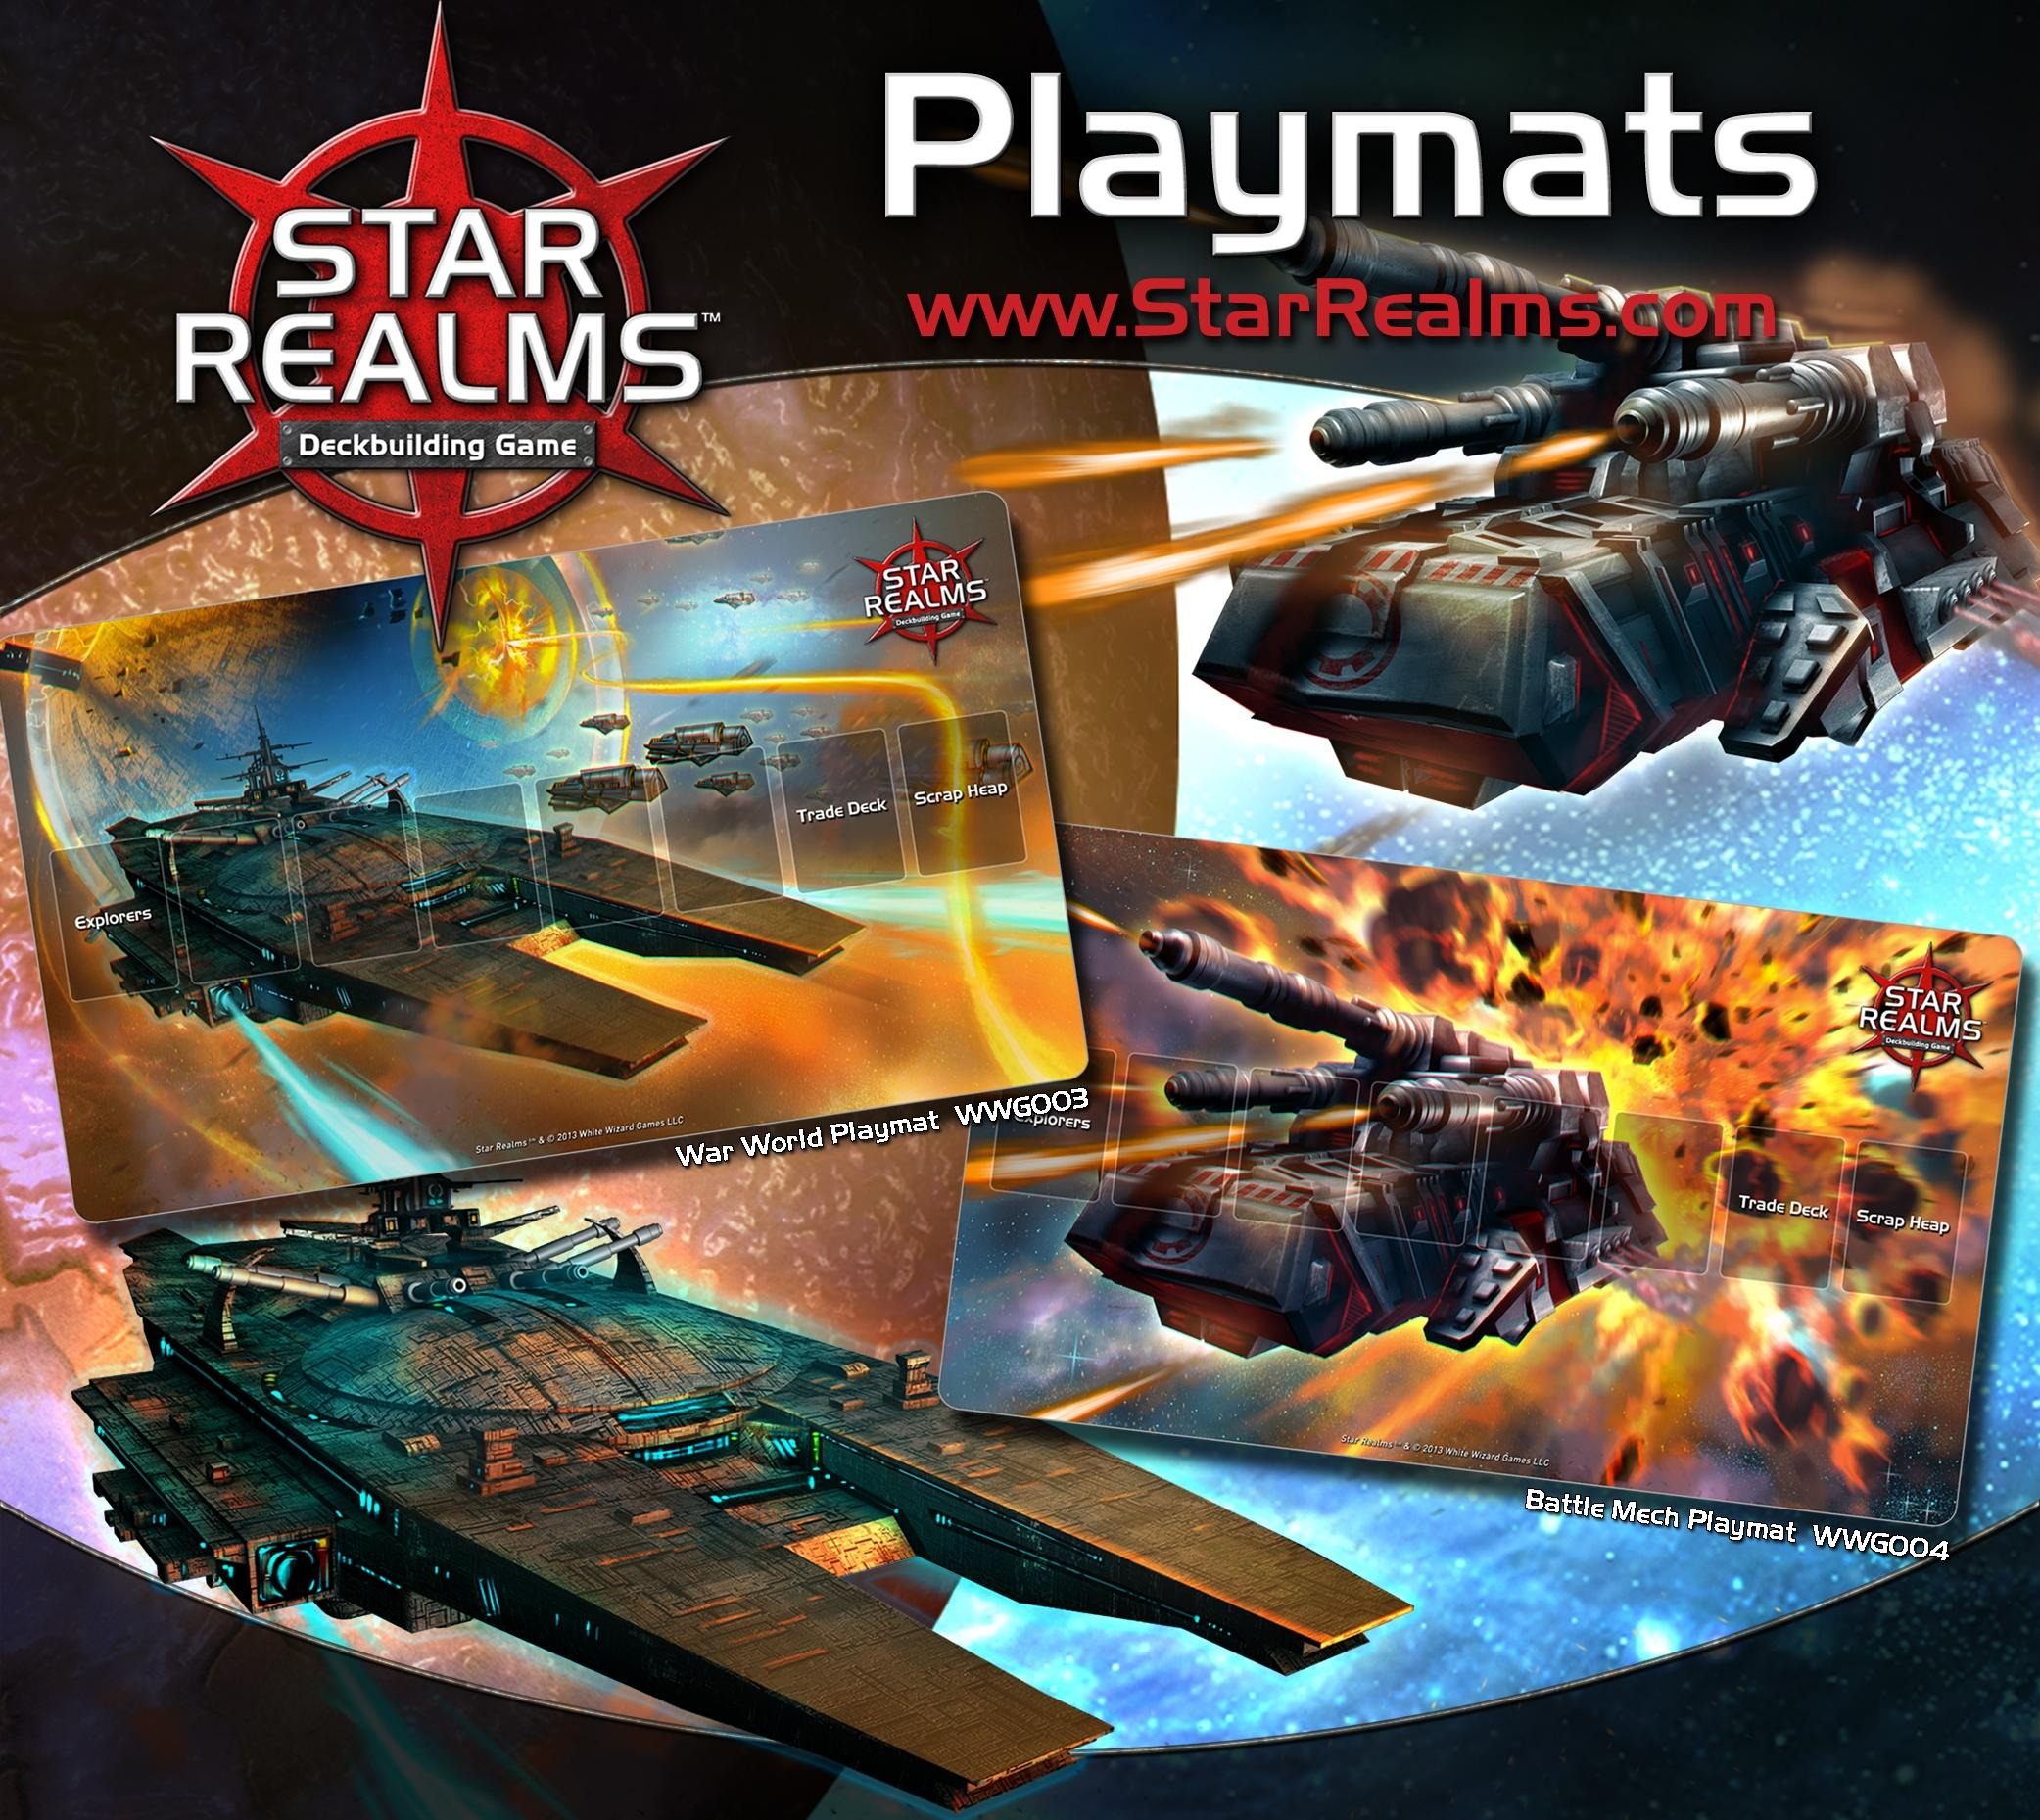 Star Realms Deck Building Game: Battle Mech Playmat Box Front